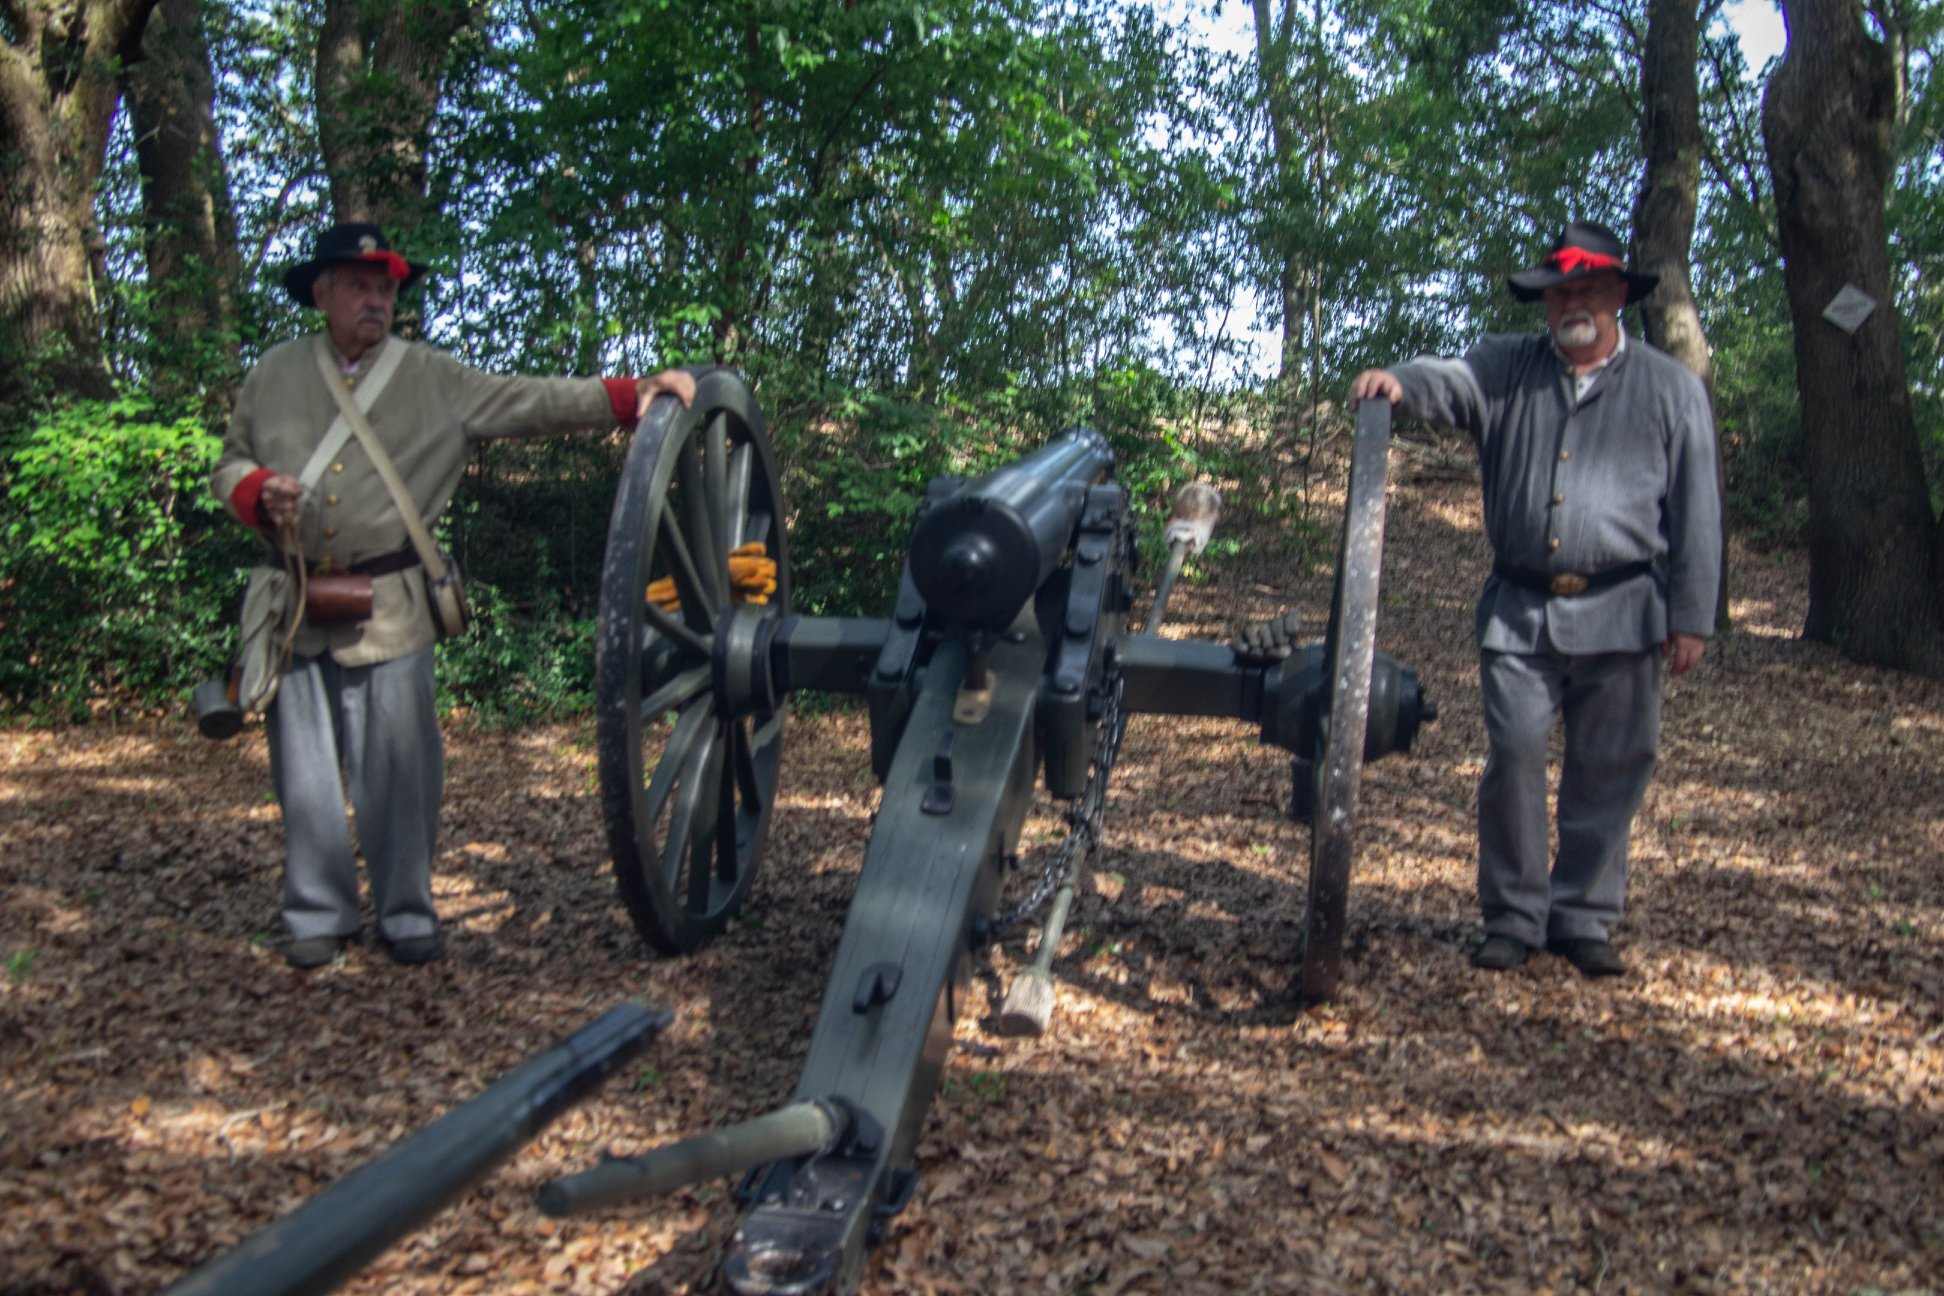 The annual anniversary of the Battle of Secessionville 12